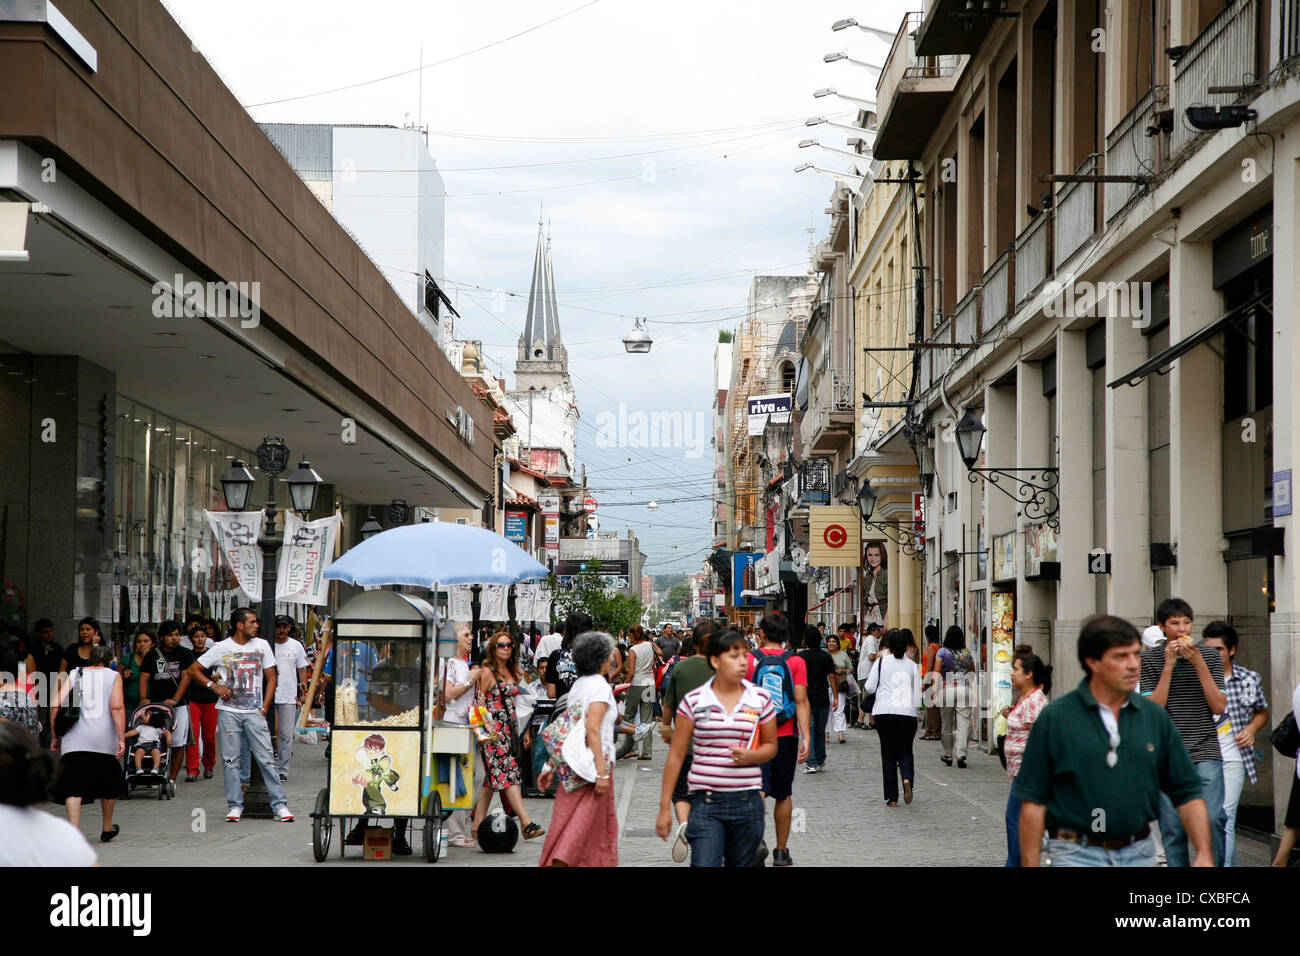 Pedestrian street in Salta city, Argentina. - Stock Image